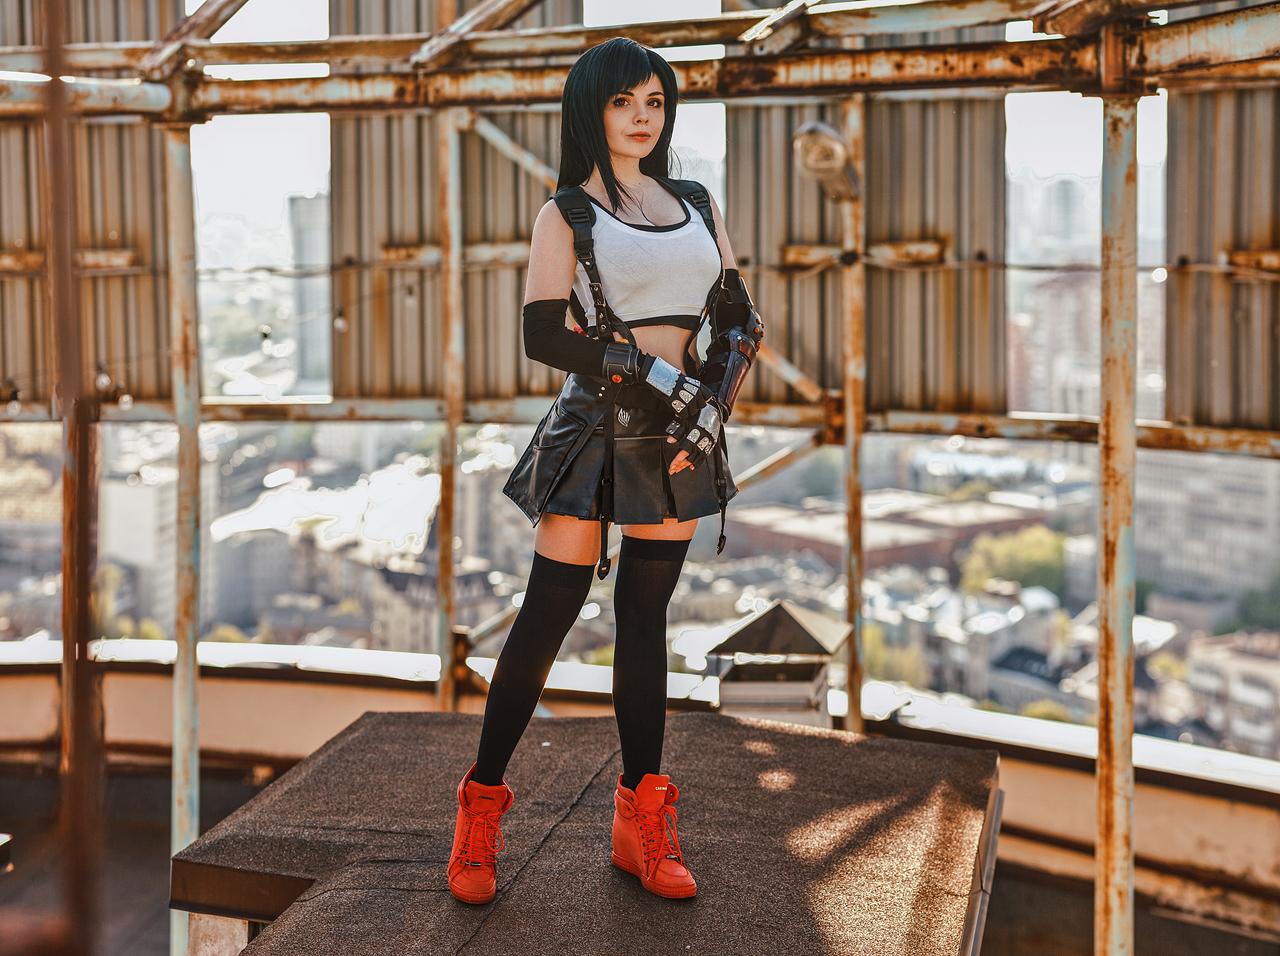 Final Fantasy VII Remake - Tifa Lockhart Cosplay